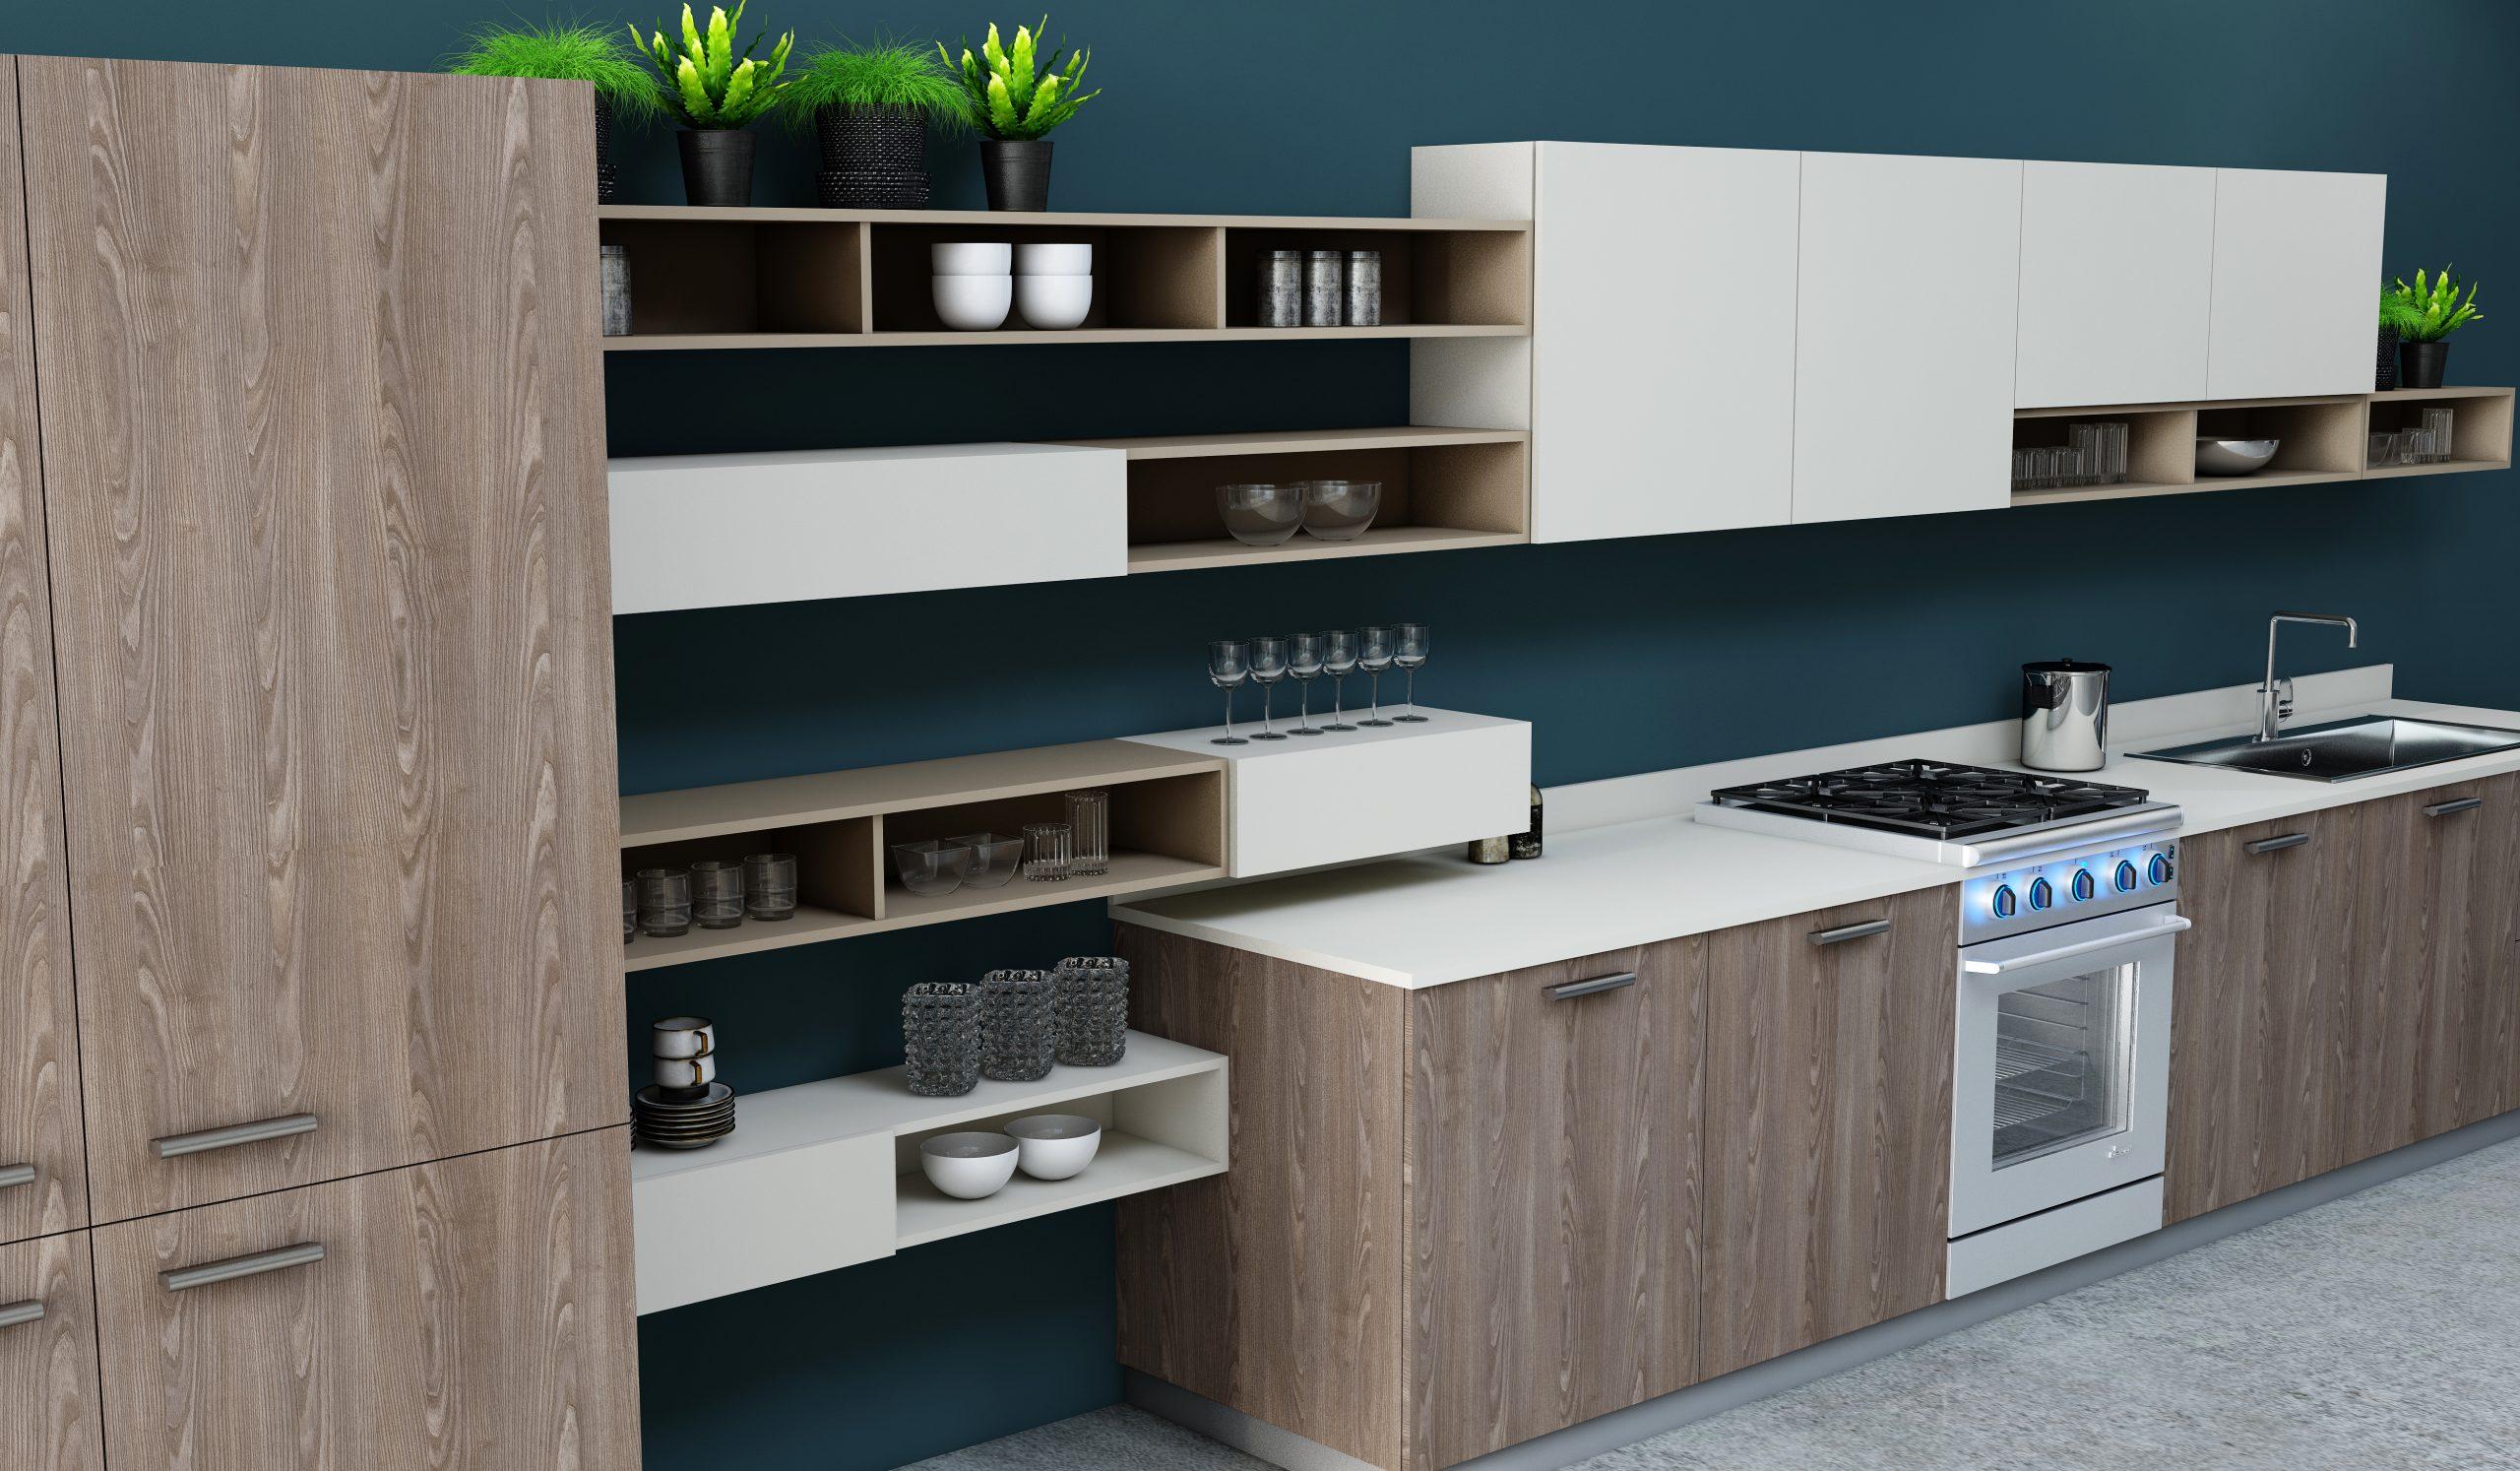 Easyline I Shaped Kitchen With Alcove in Brown Orleans Oak Woodgrain & Cream Matt Finish